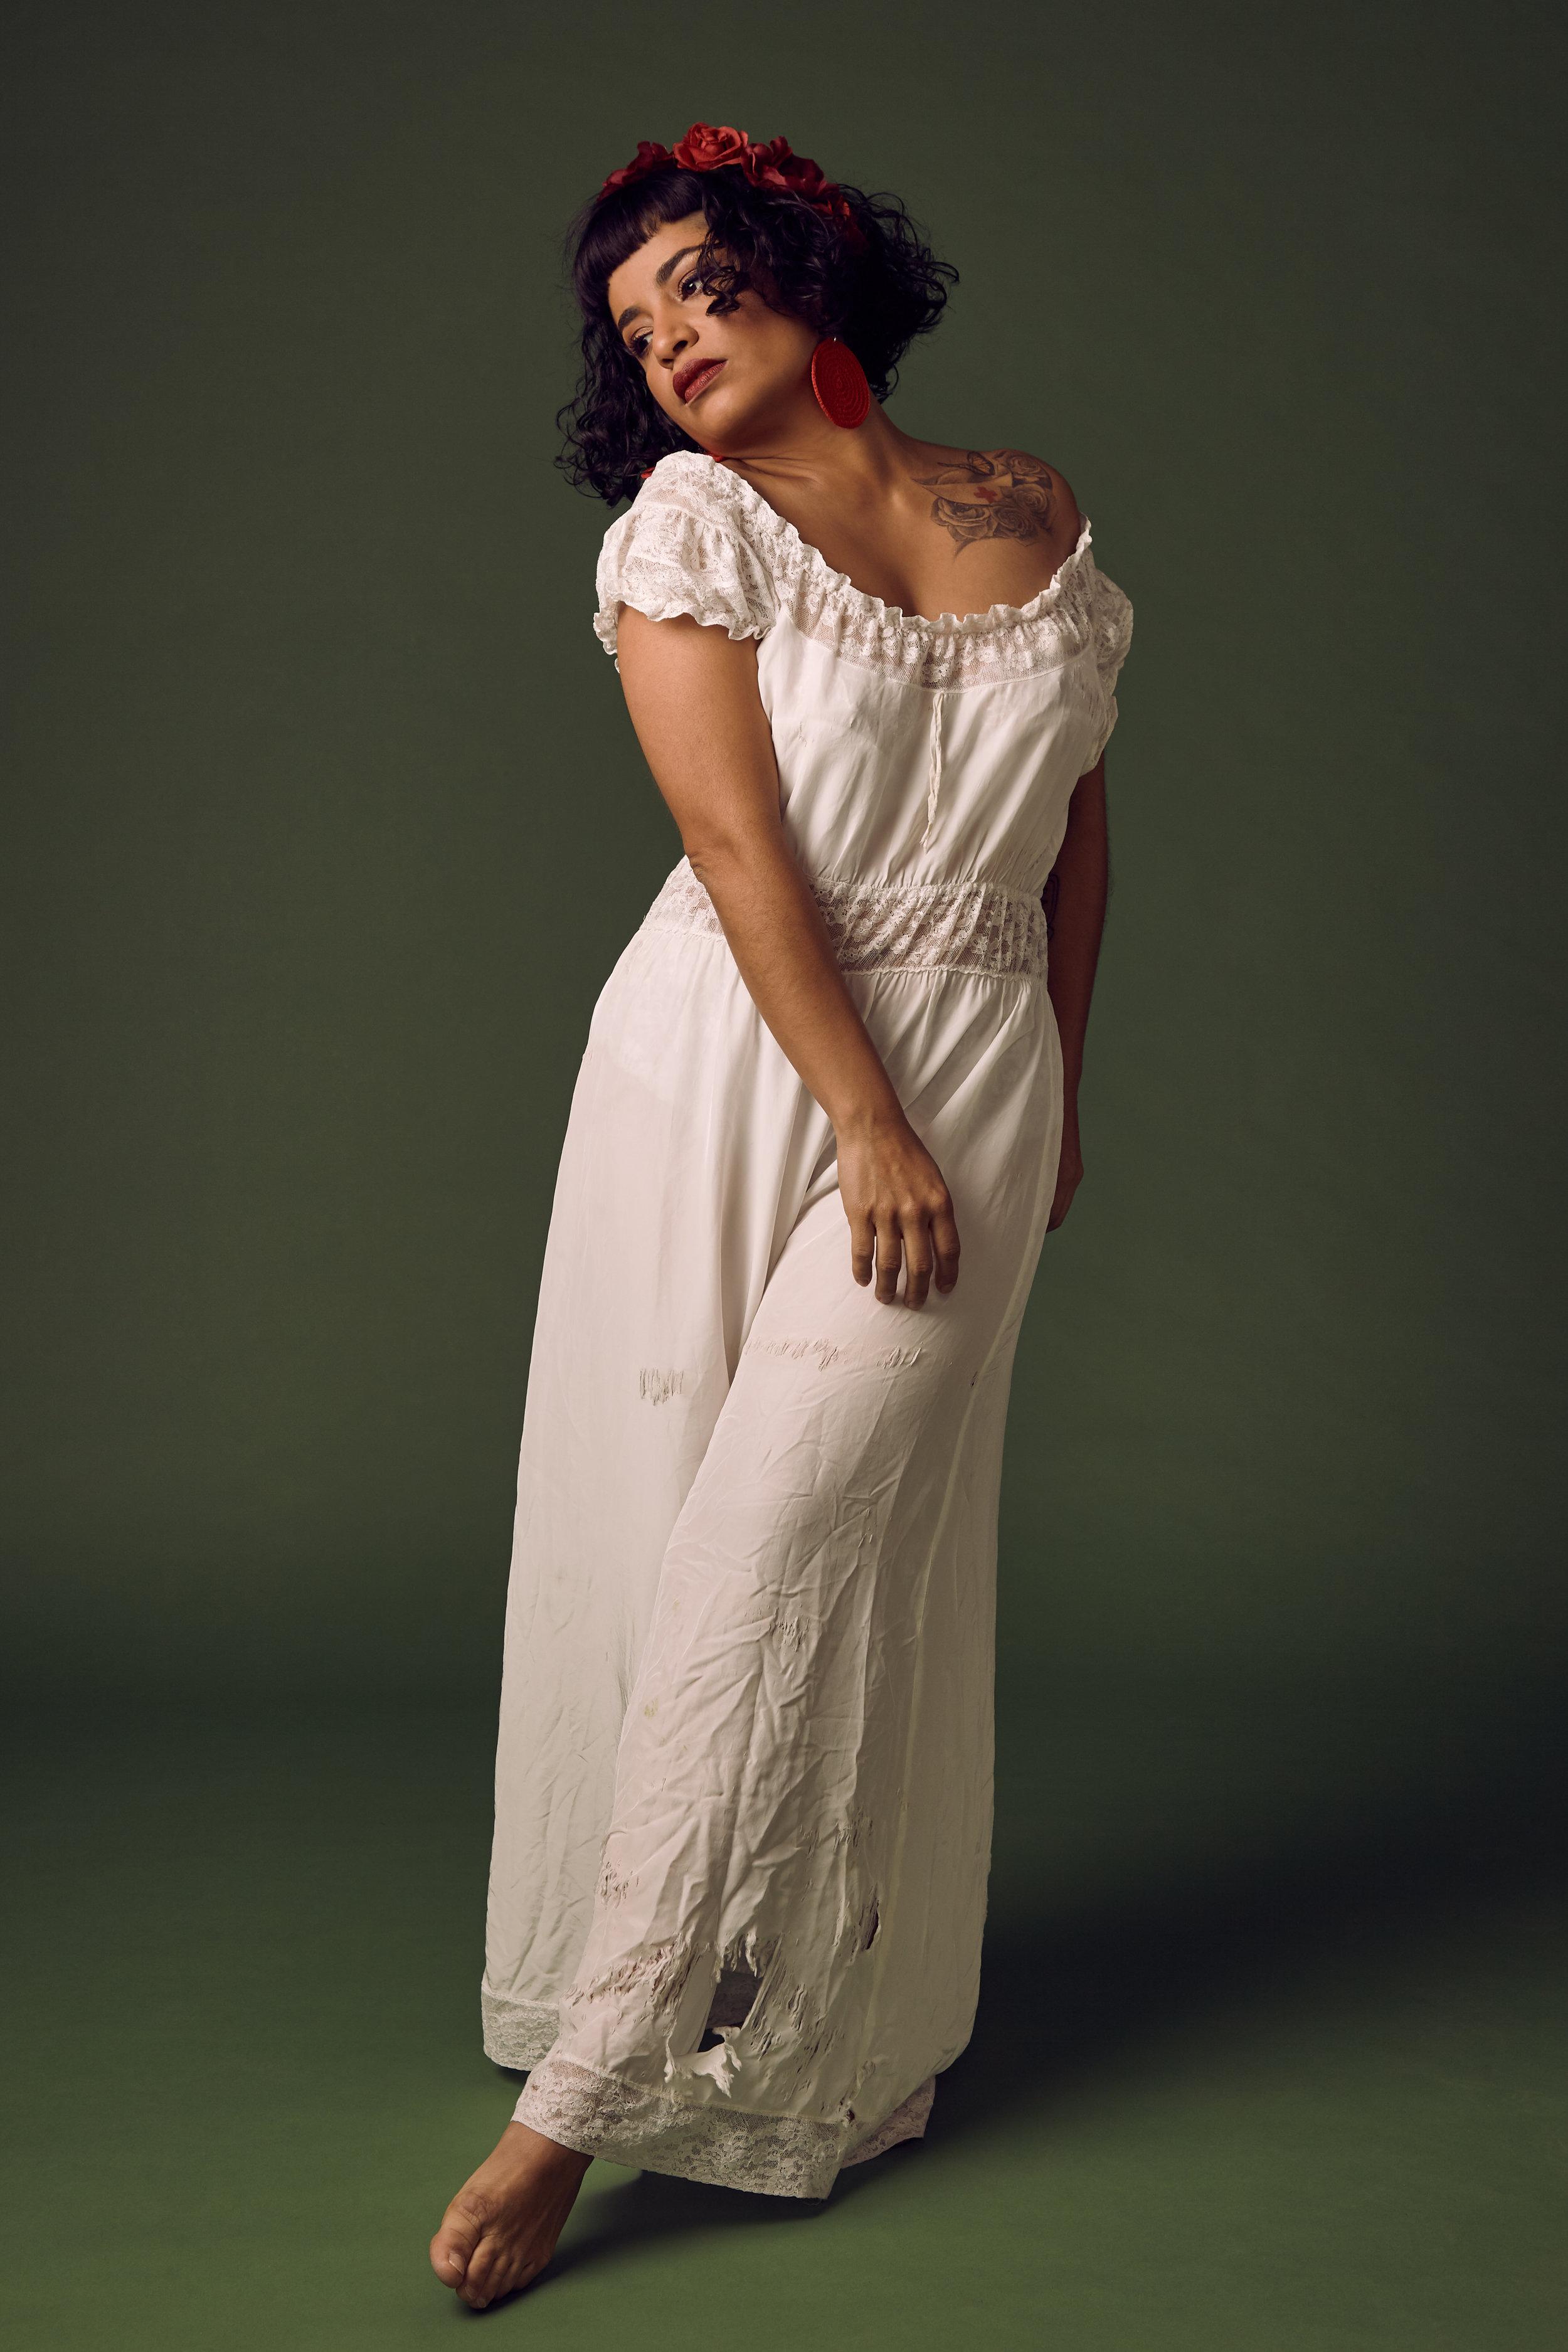 02 - Irma Villafuerte - Les FemmesFatales by Christie Vuong.jpg